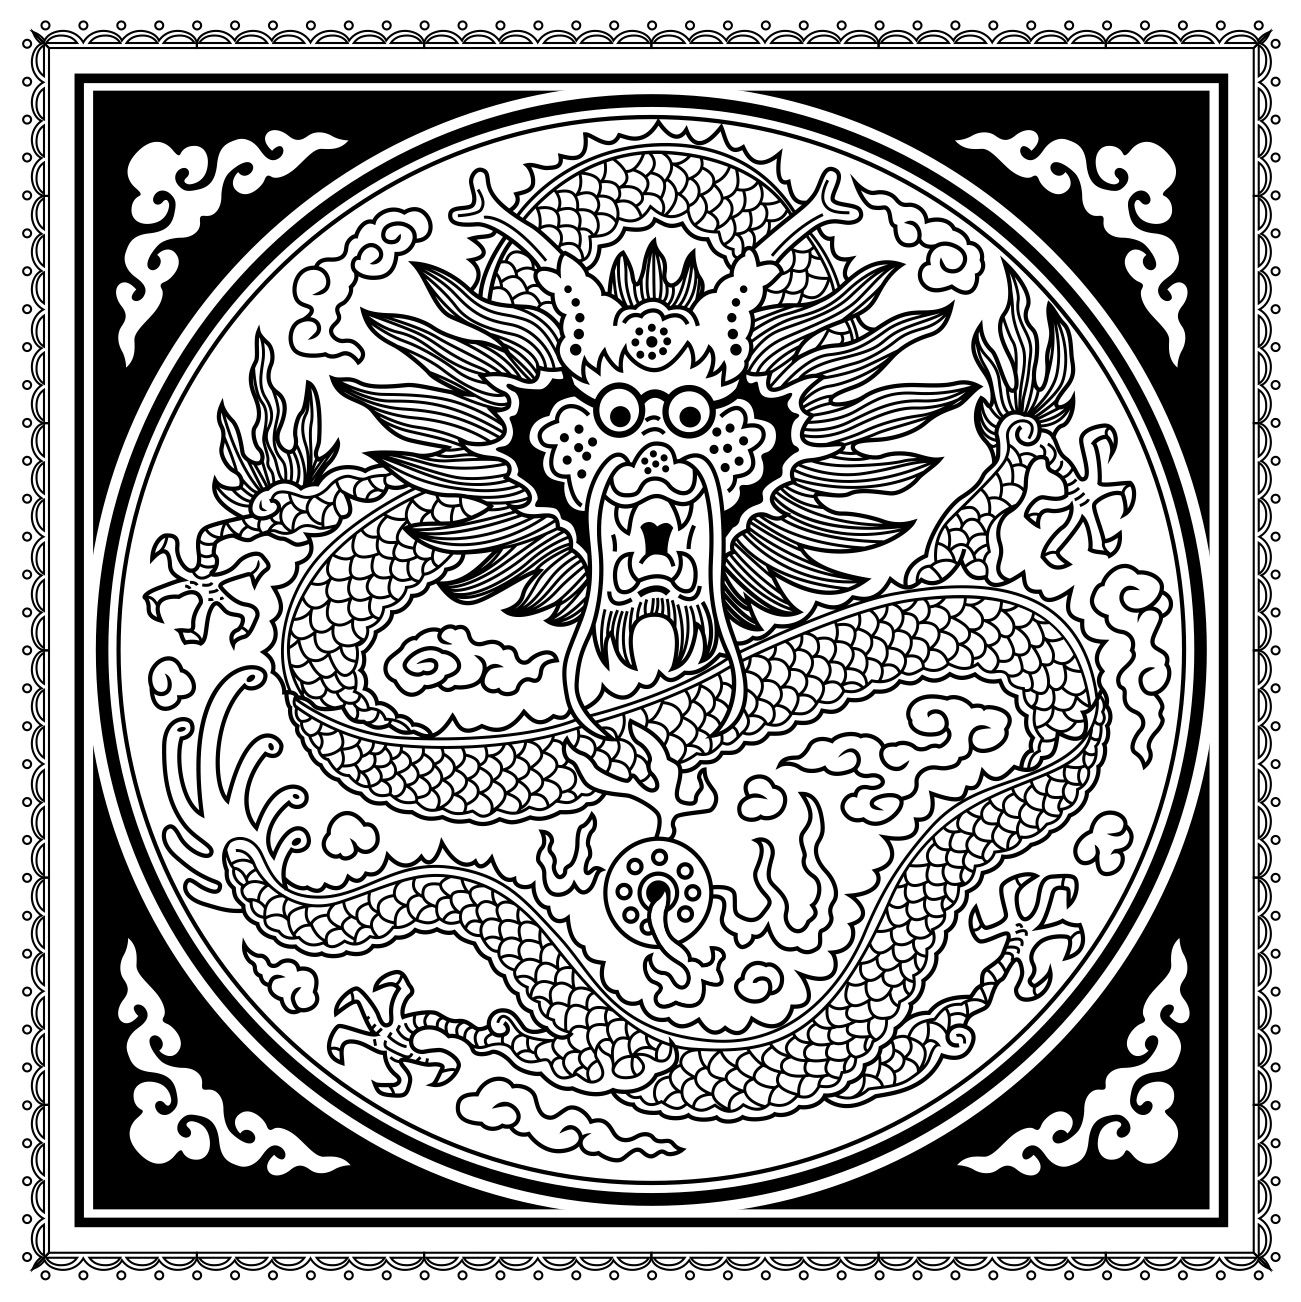 Dragon Coloring Page From Motif Magic Dragon Coloring Page Elephant Coloring Page Coloring Books